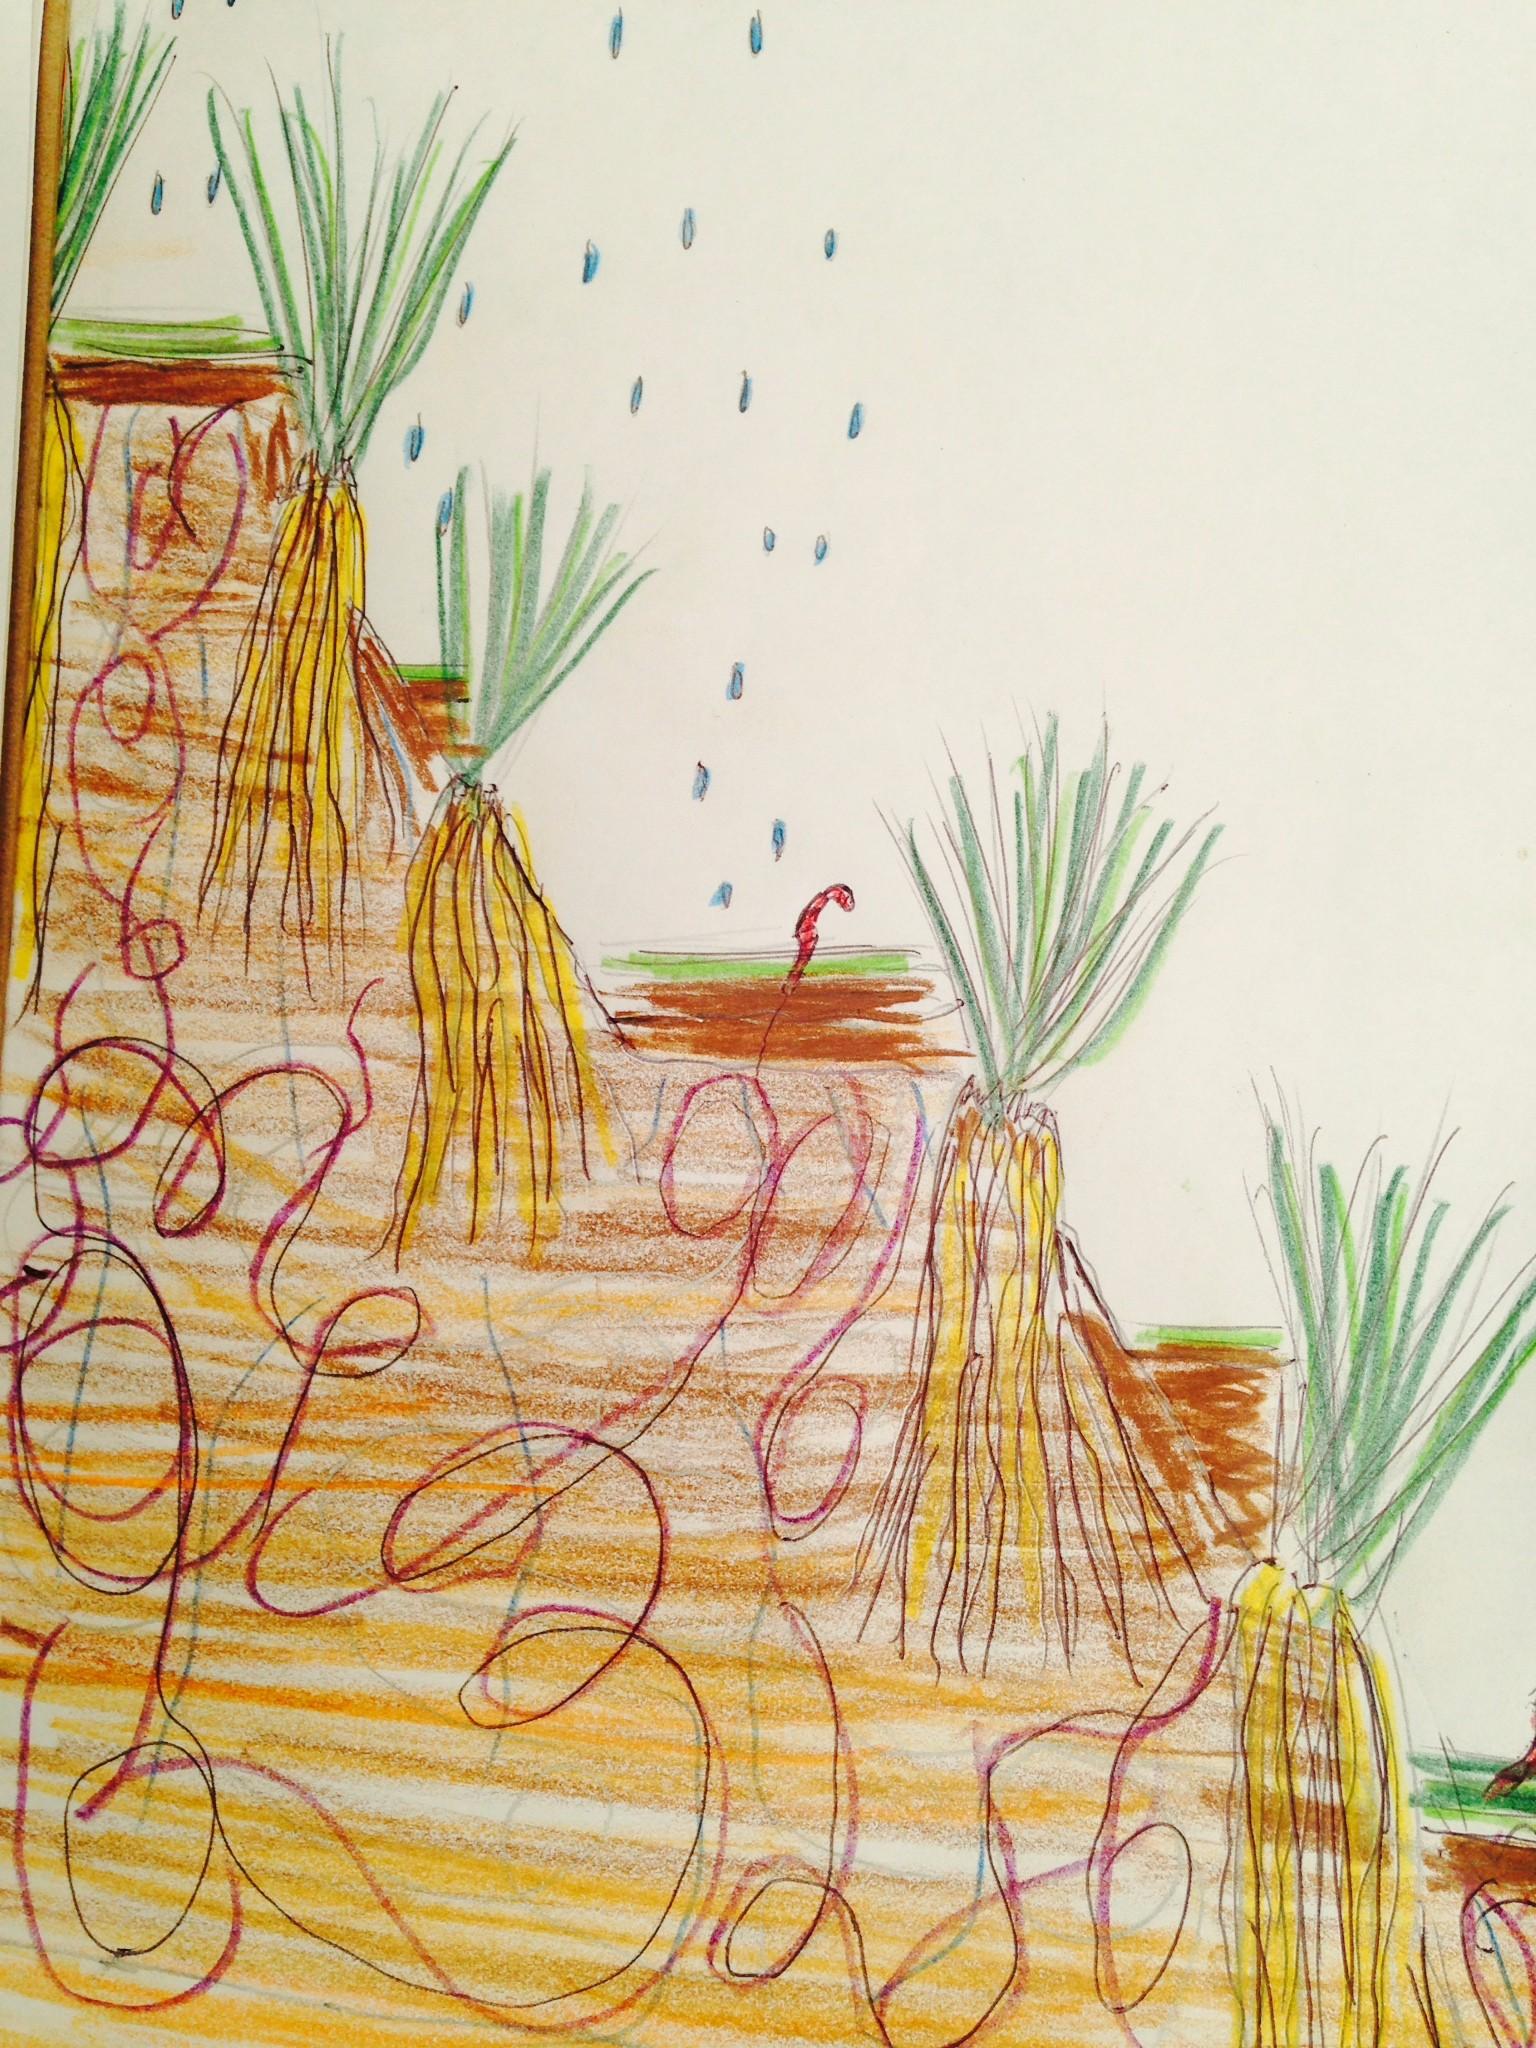 rec-vetiver-worms-illustration.jpg